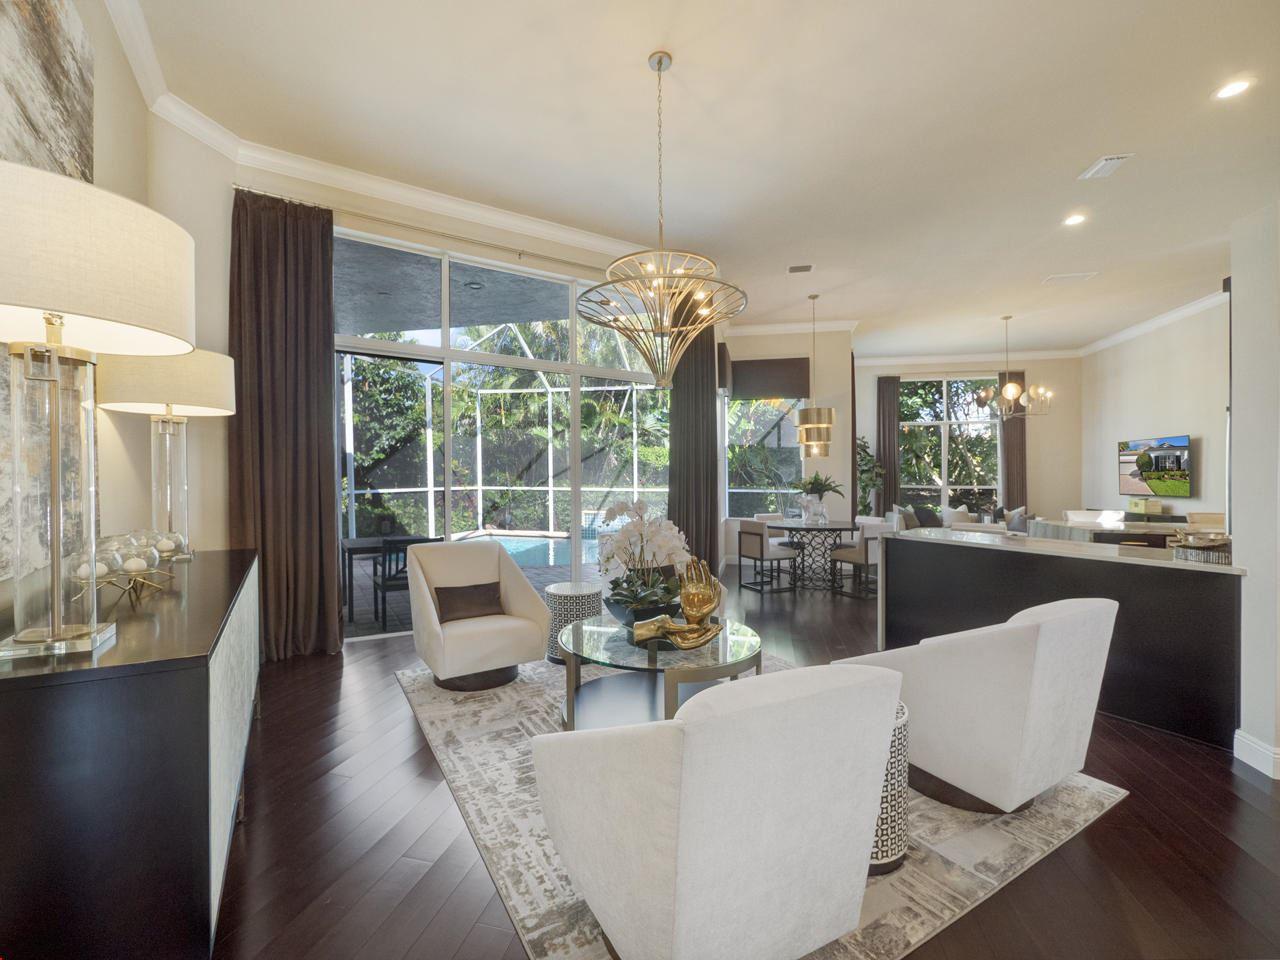 Photo of 316 Sunset Bay Lane, Palm Beach Gardens, FL 33418 (MLS # RX-10625609)